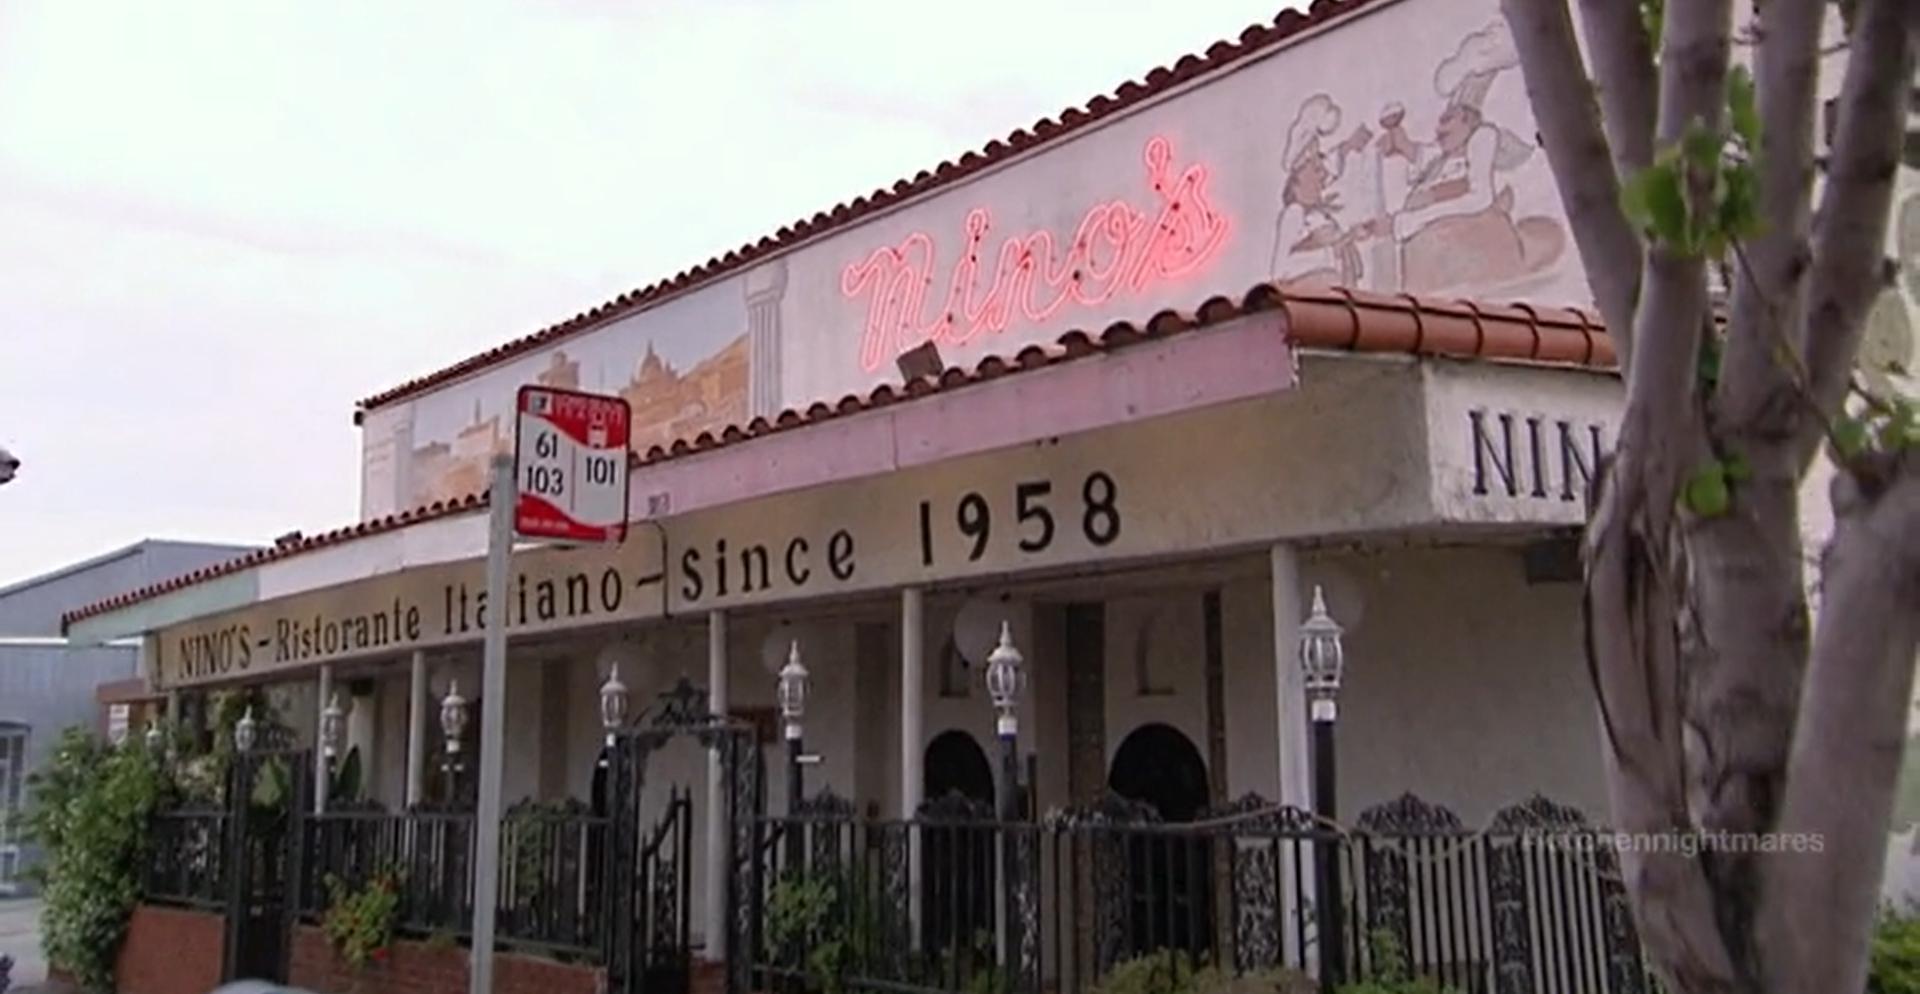 Nino S Italian Restaurant Kitchen Nightmares Wiki Fandom